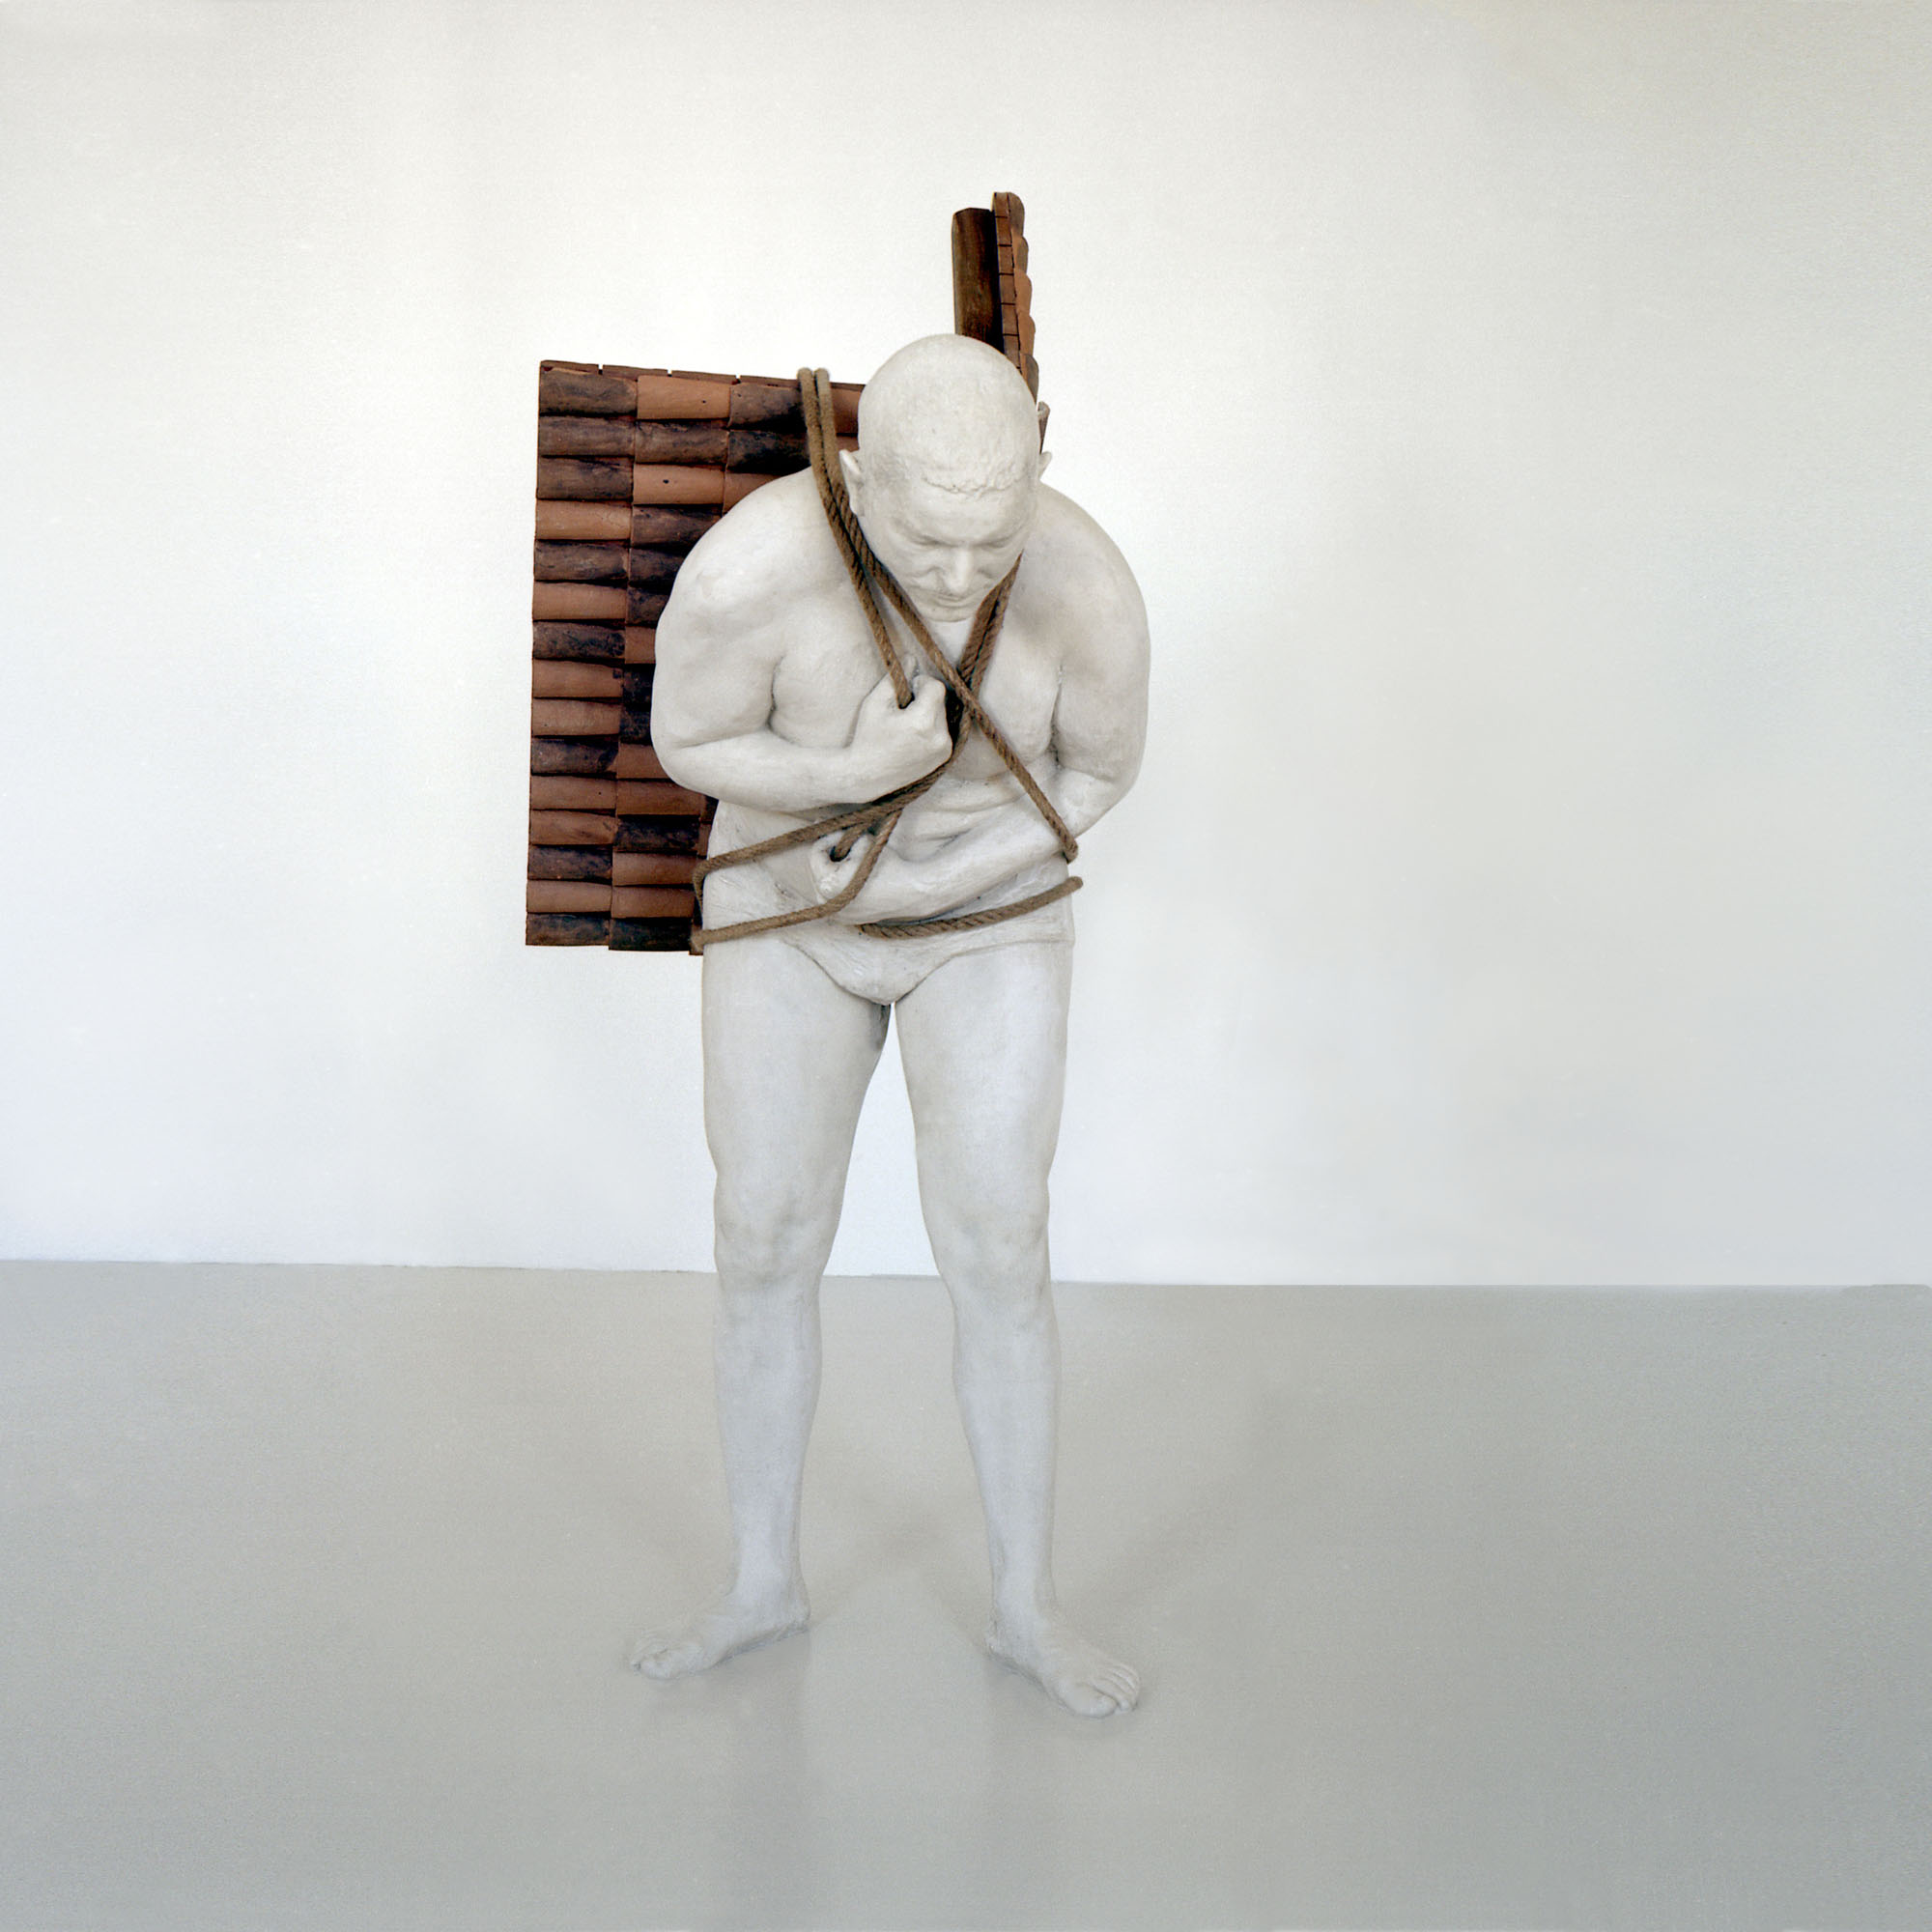 Adrian Paci, Home to go, 2001